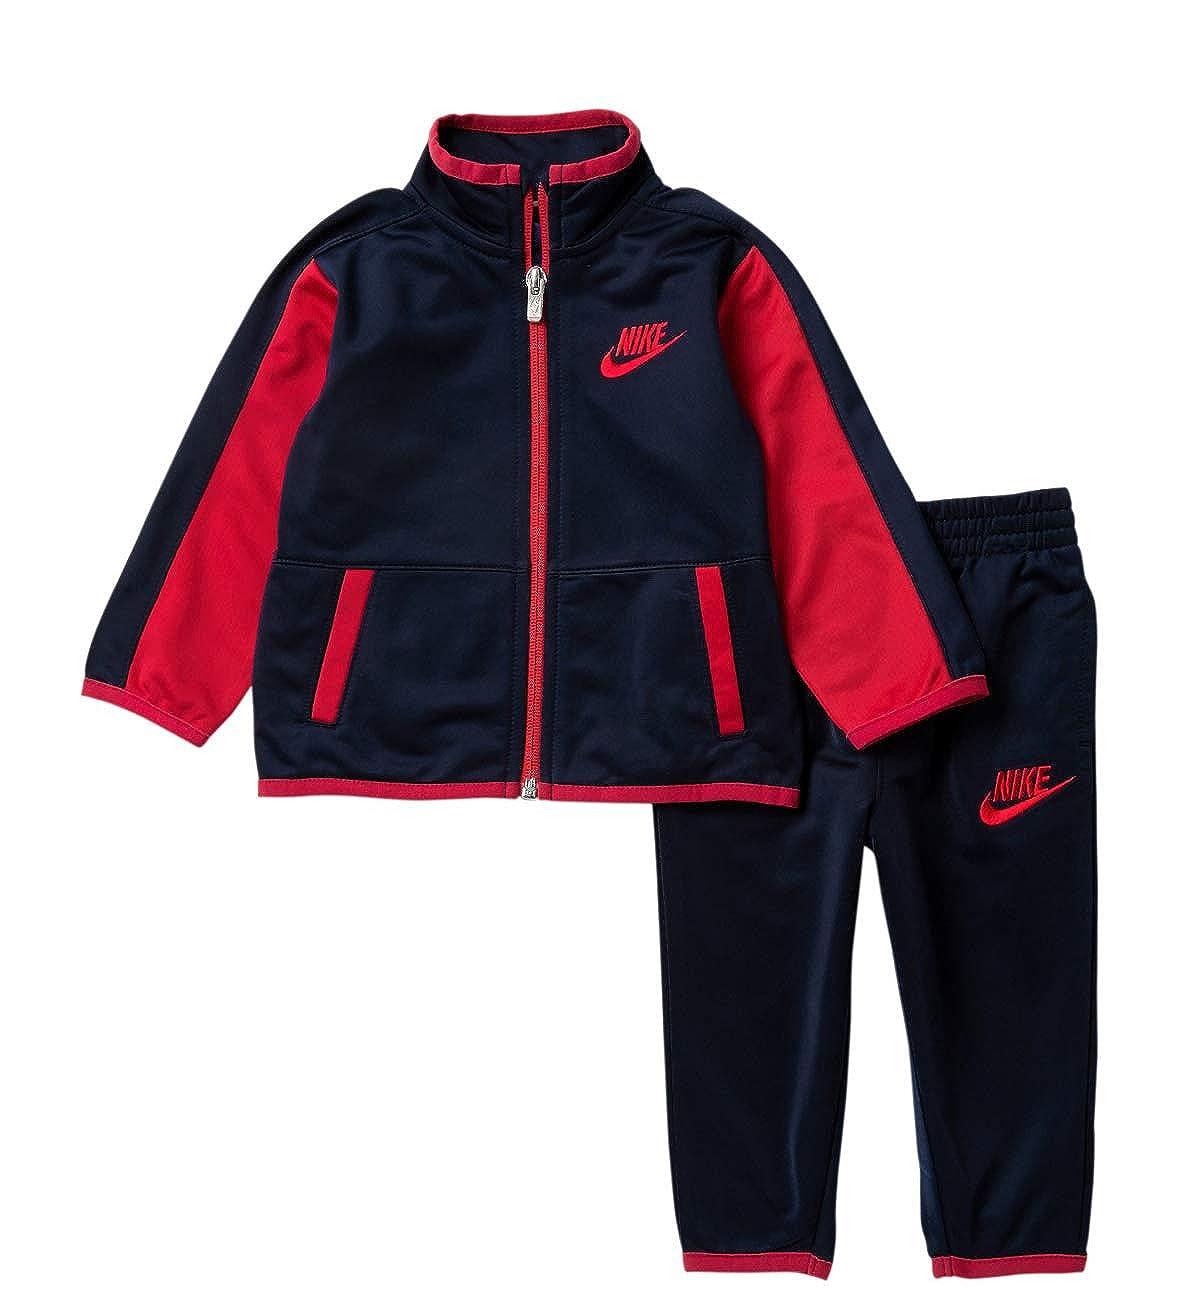 NIKE Boy's Futura Tricot Jacket and Pants Set (Obsidian